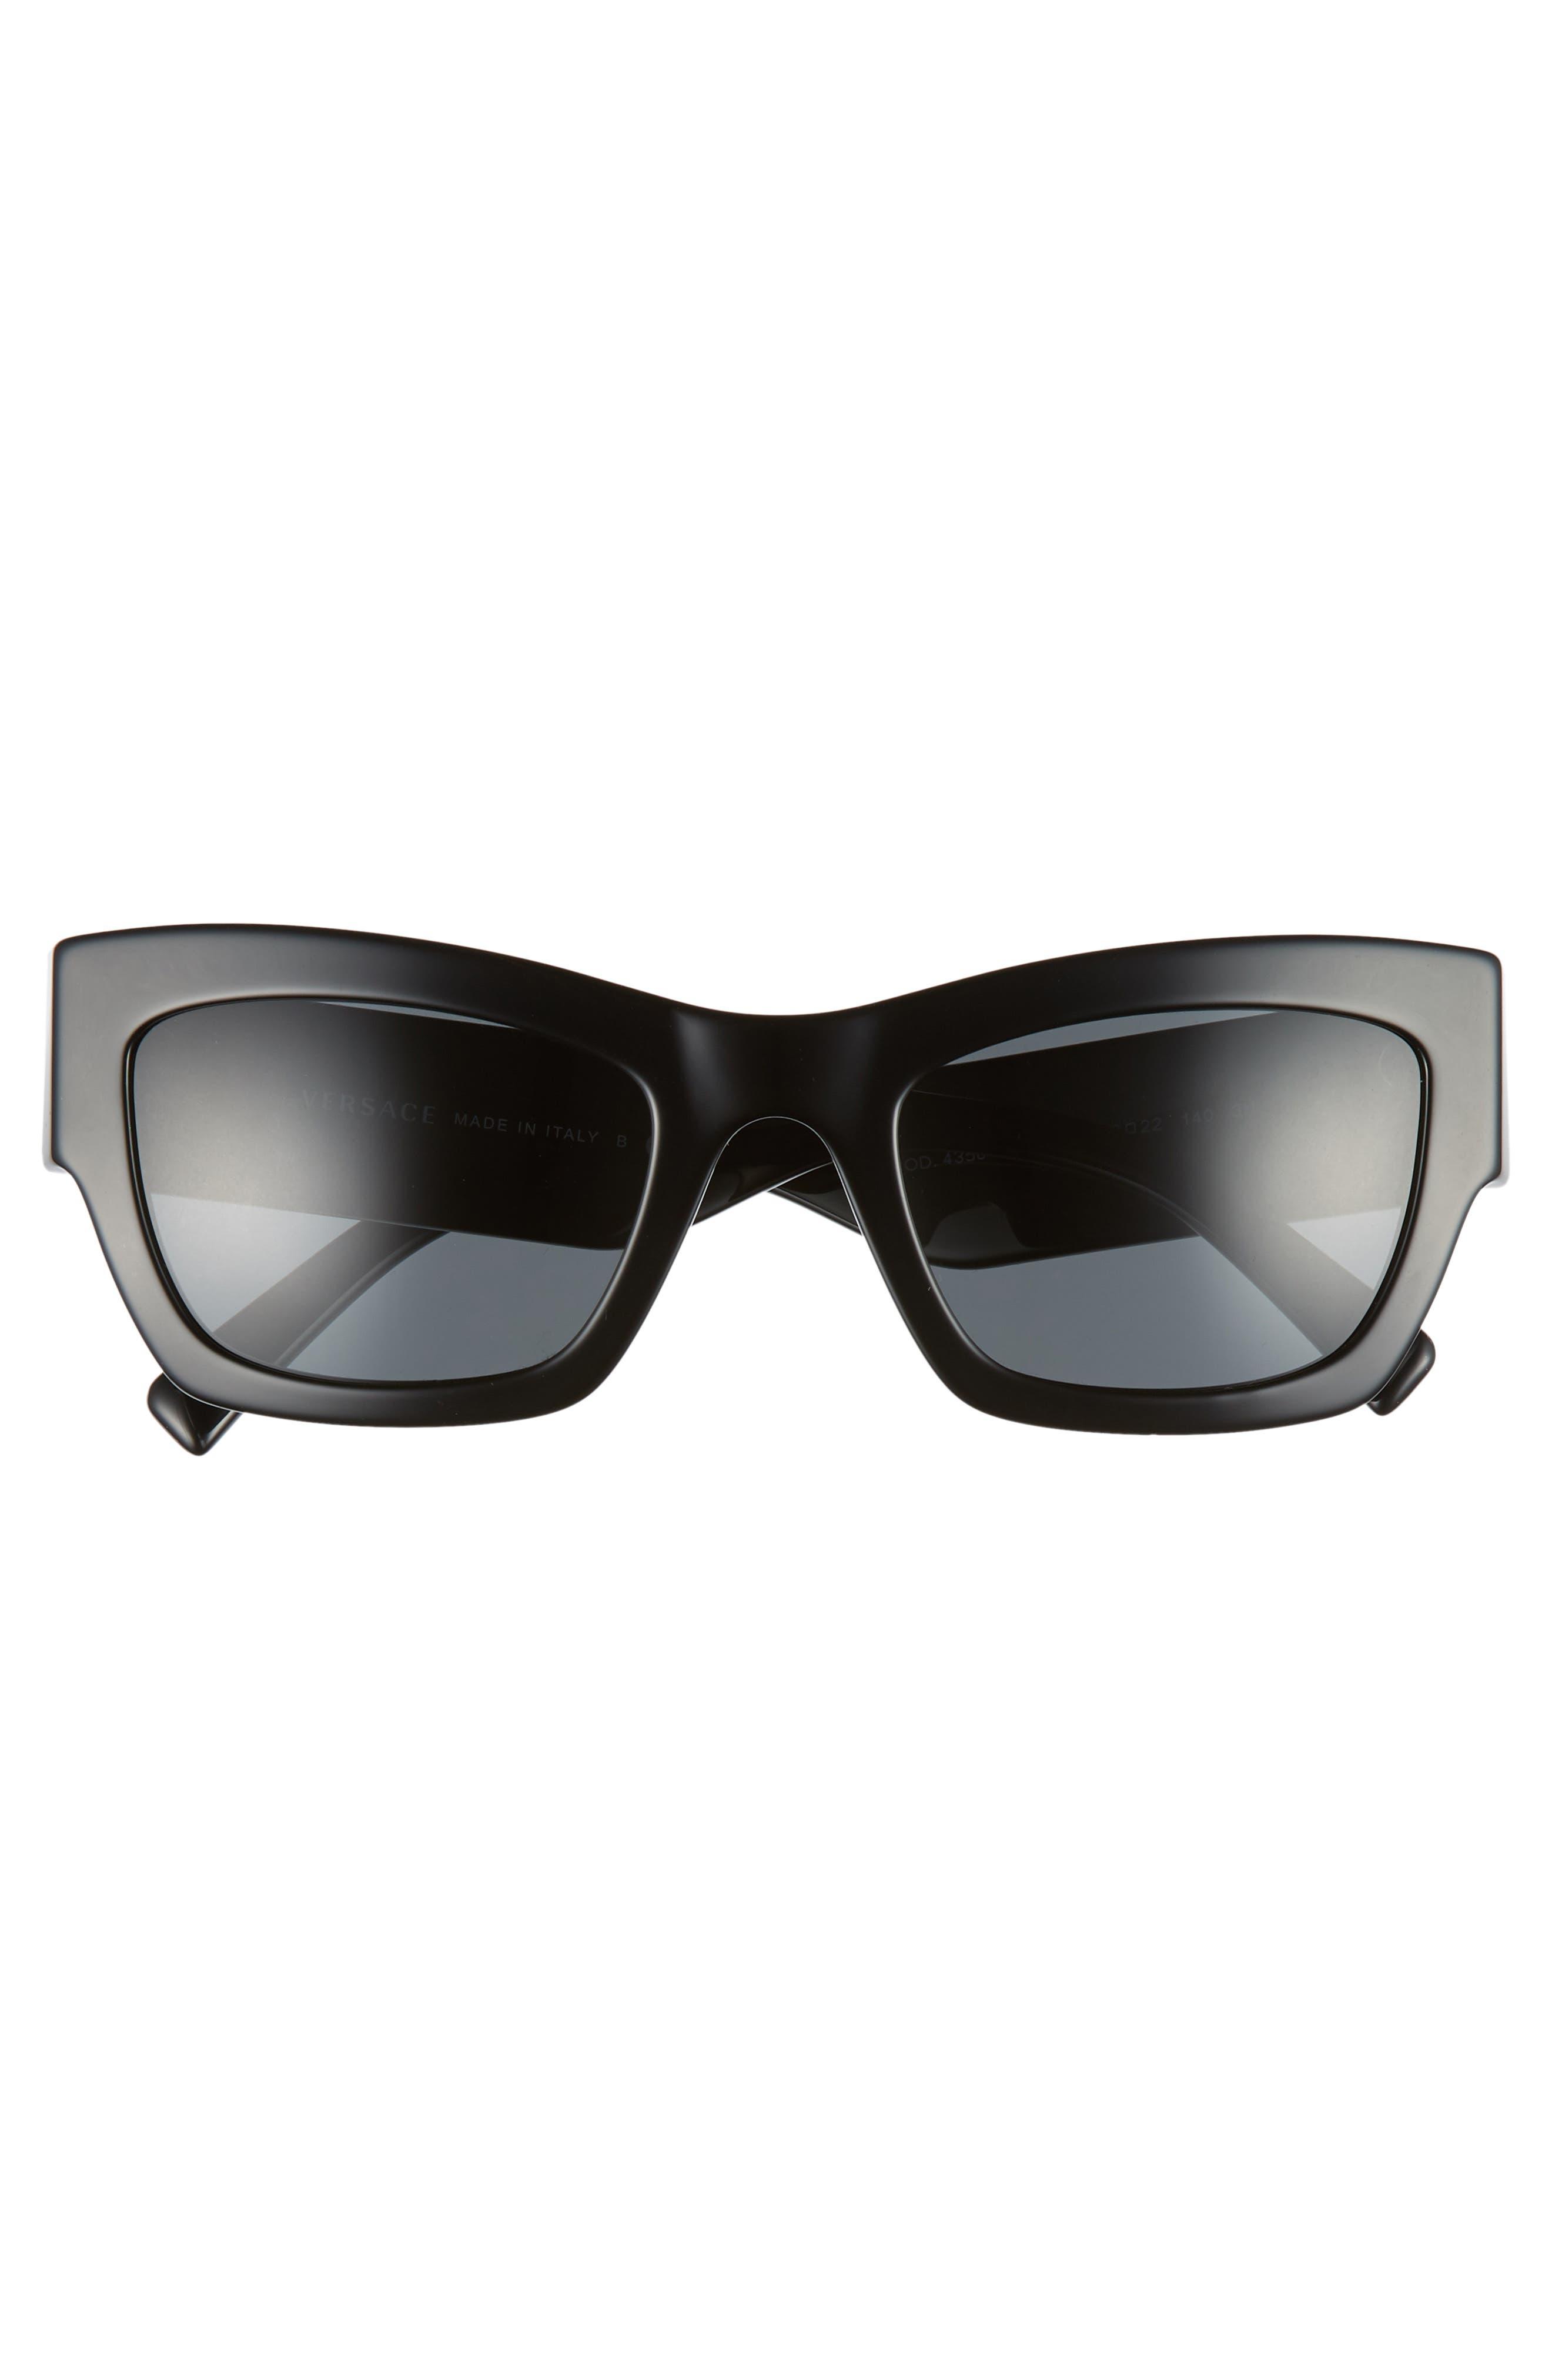 Medusa 52mm Square Sunglasses,                             Alternate thumbnail 3, color,                             GREY SOLID